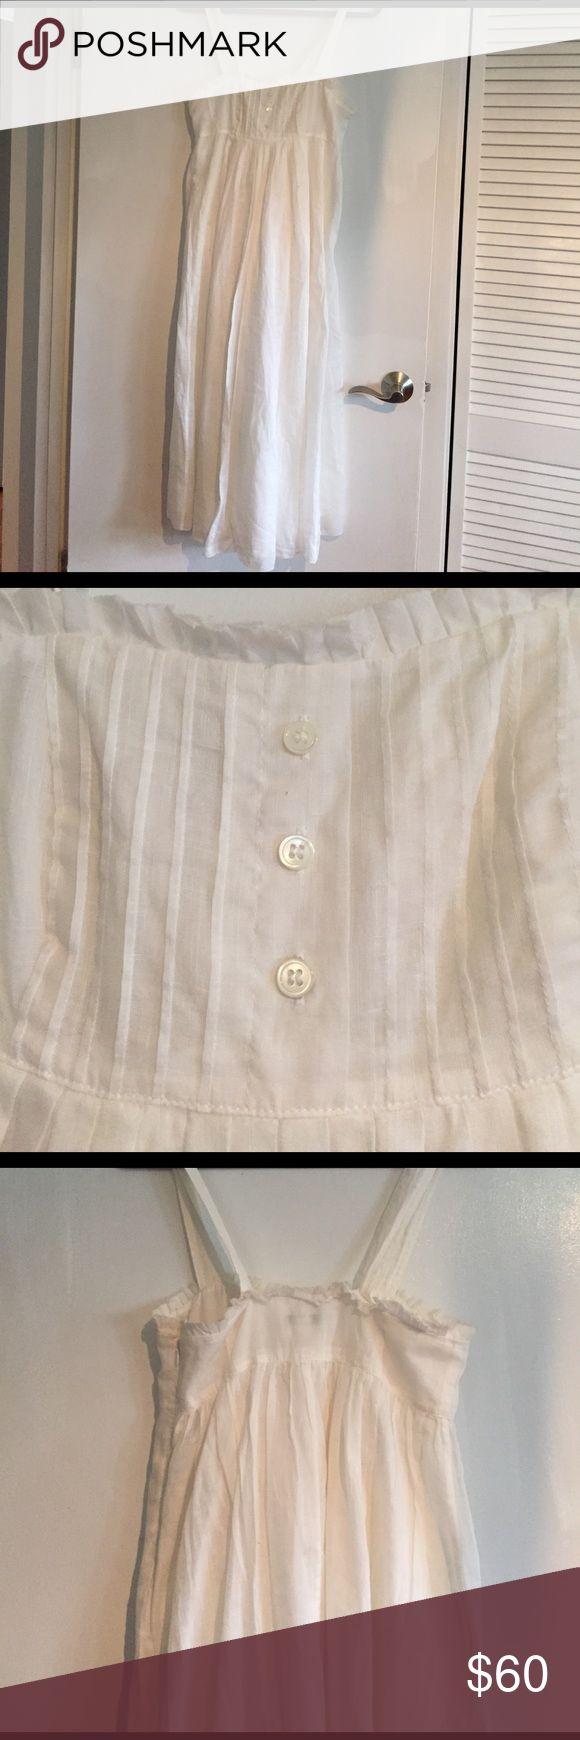 Beautiful cotton summer dress by J.Crew J.crew Summer Dress, worn once as wedding dress. J. Crew Dresses Maxi